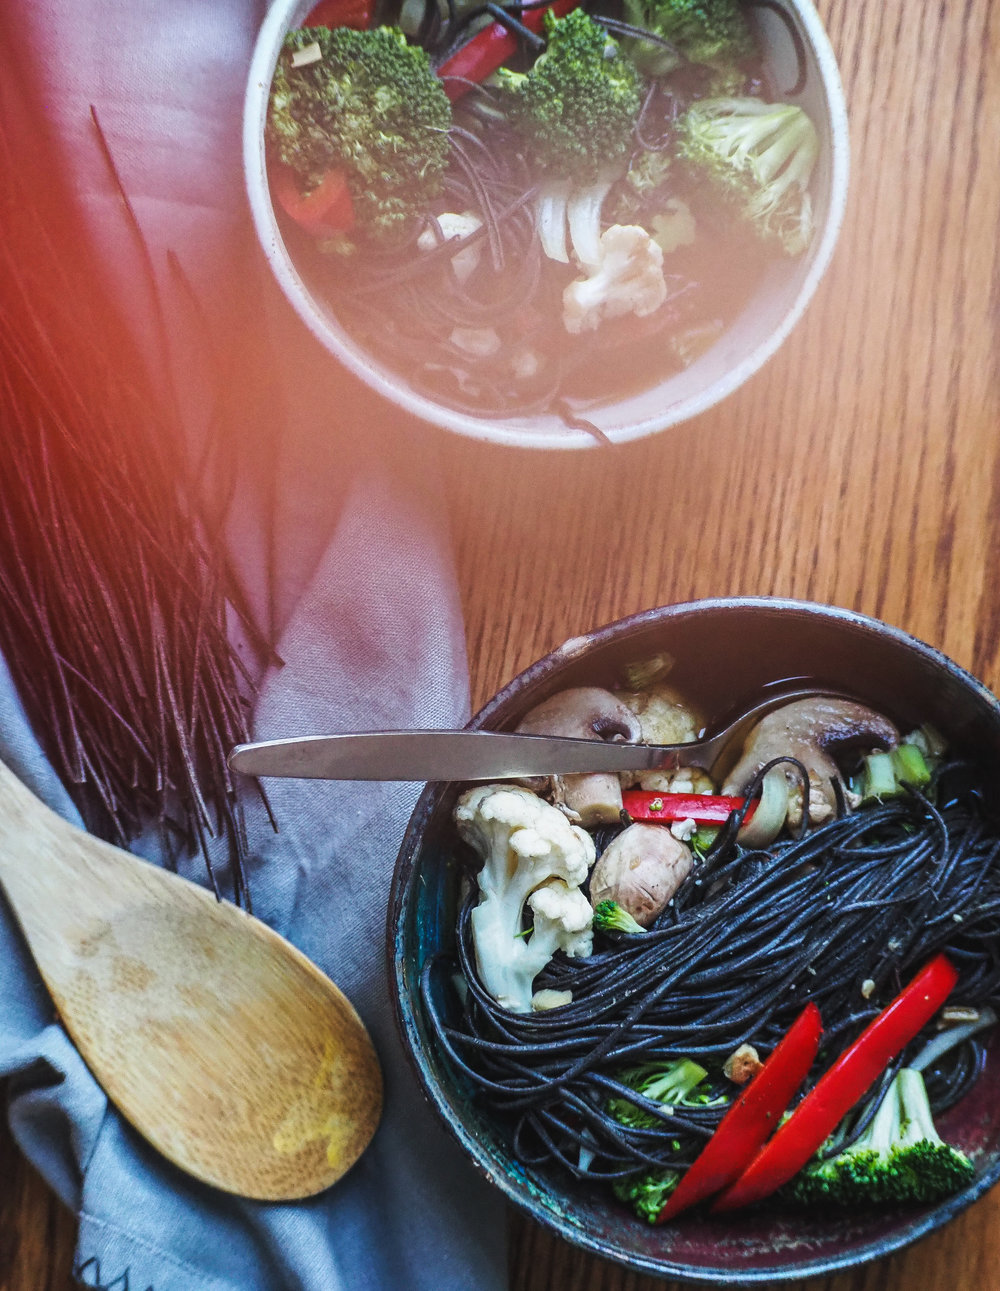 Ramen Inspired Soup with Black Bean Noodles | Plant-Based Vegan, Oil-Free